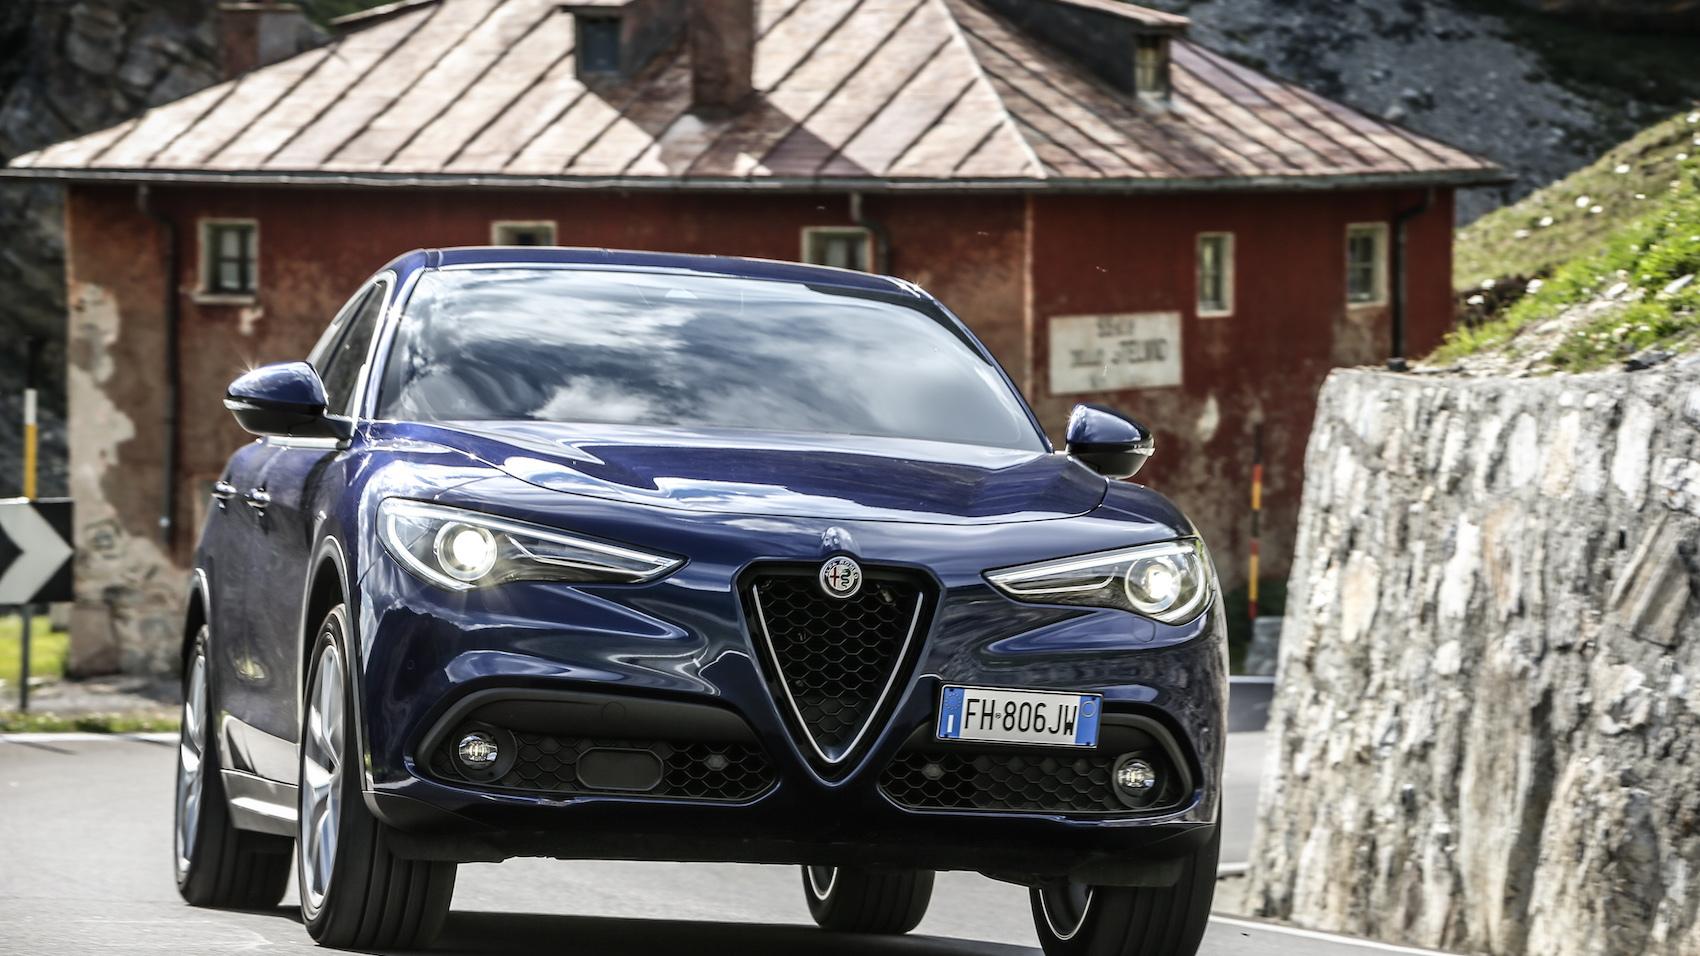 Alfa Romeo Stelvio Quadrifoglio The Fastest Suv Around The Ring